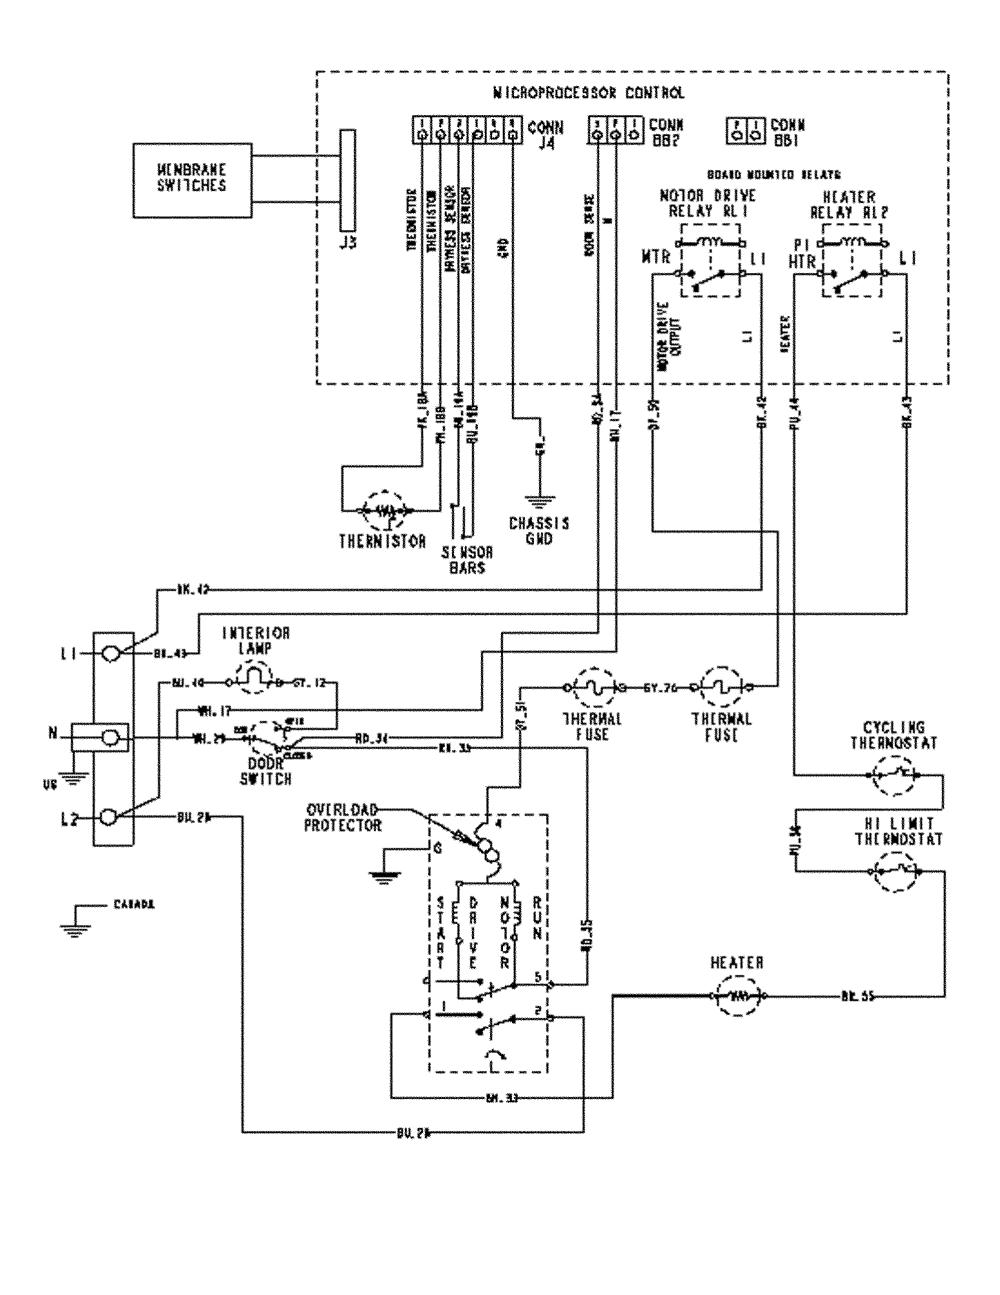 medium resolution of maytag wiring schematic wiring diagram maytag wiring diagram maytag wiring diagram